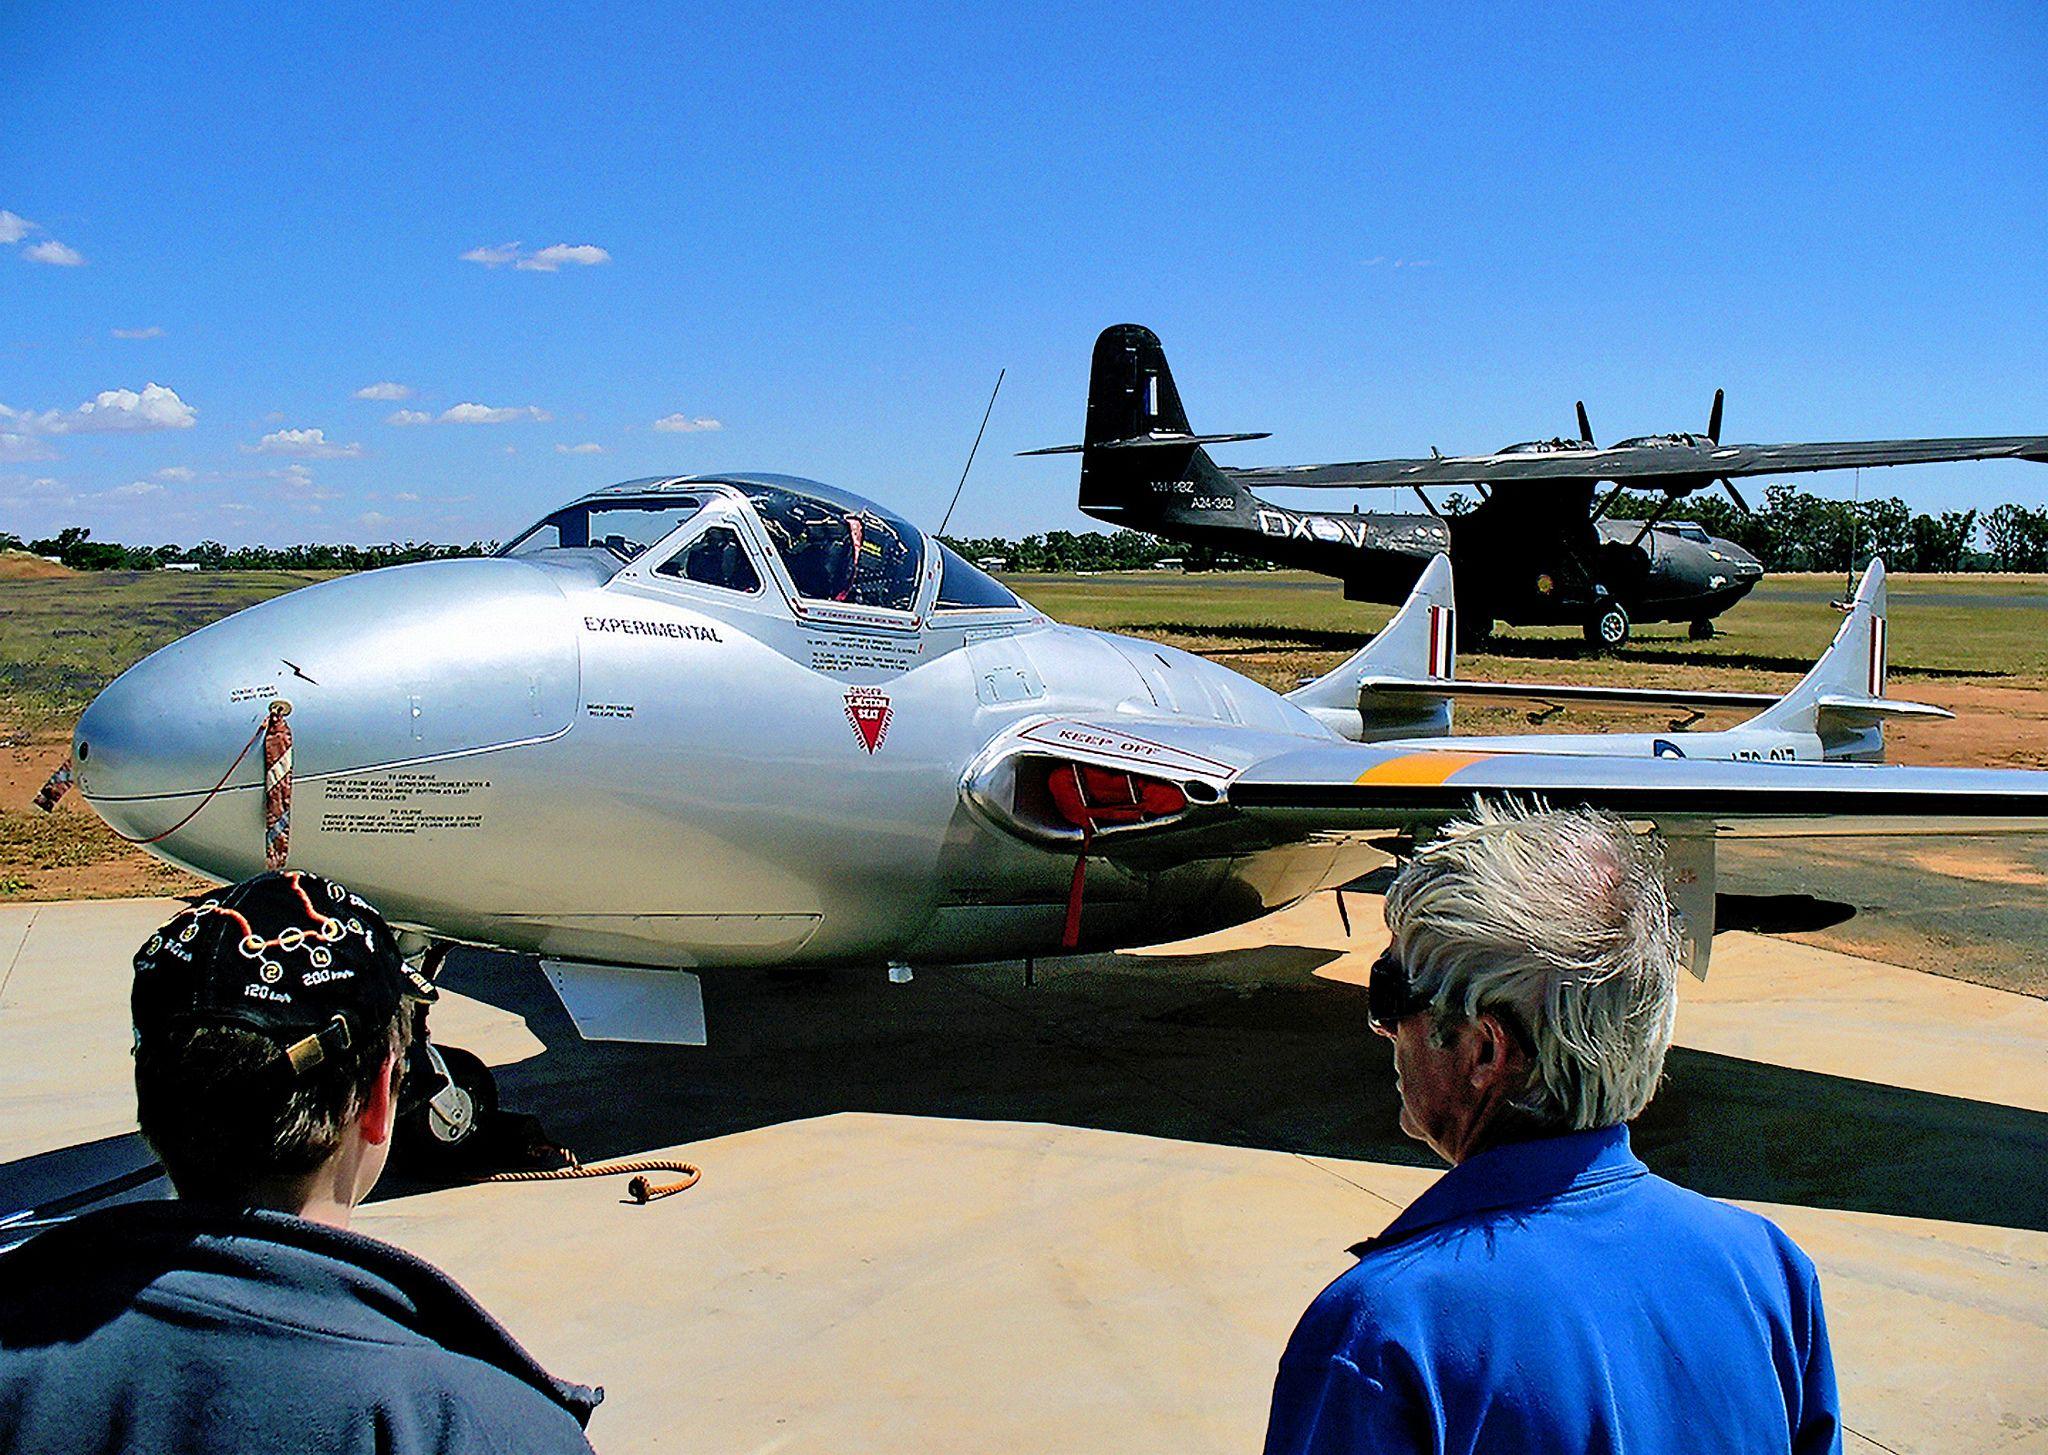 27 November 2005 Vintage warbirds, a de Havilland DH115